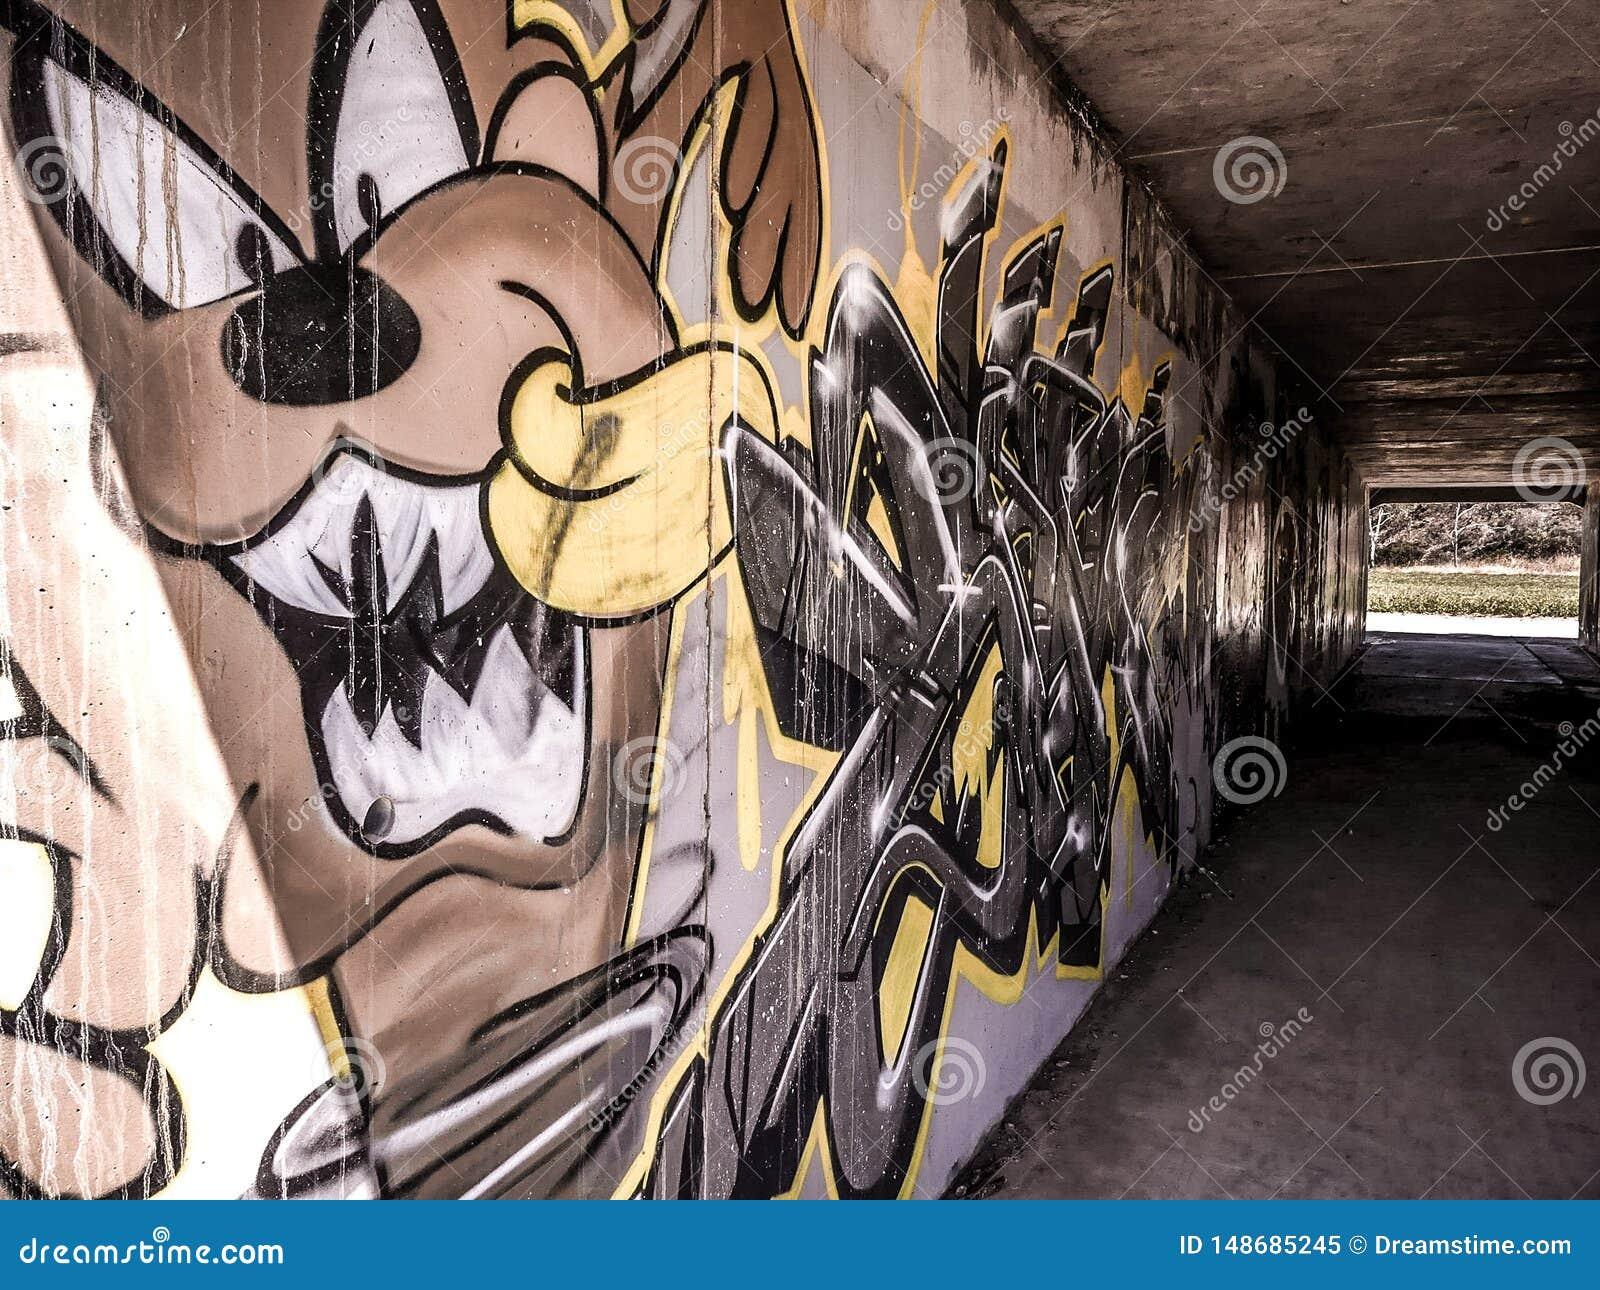 Tunnel Art Graffiti